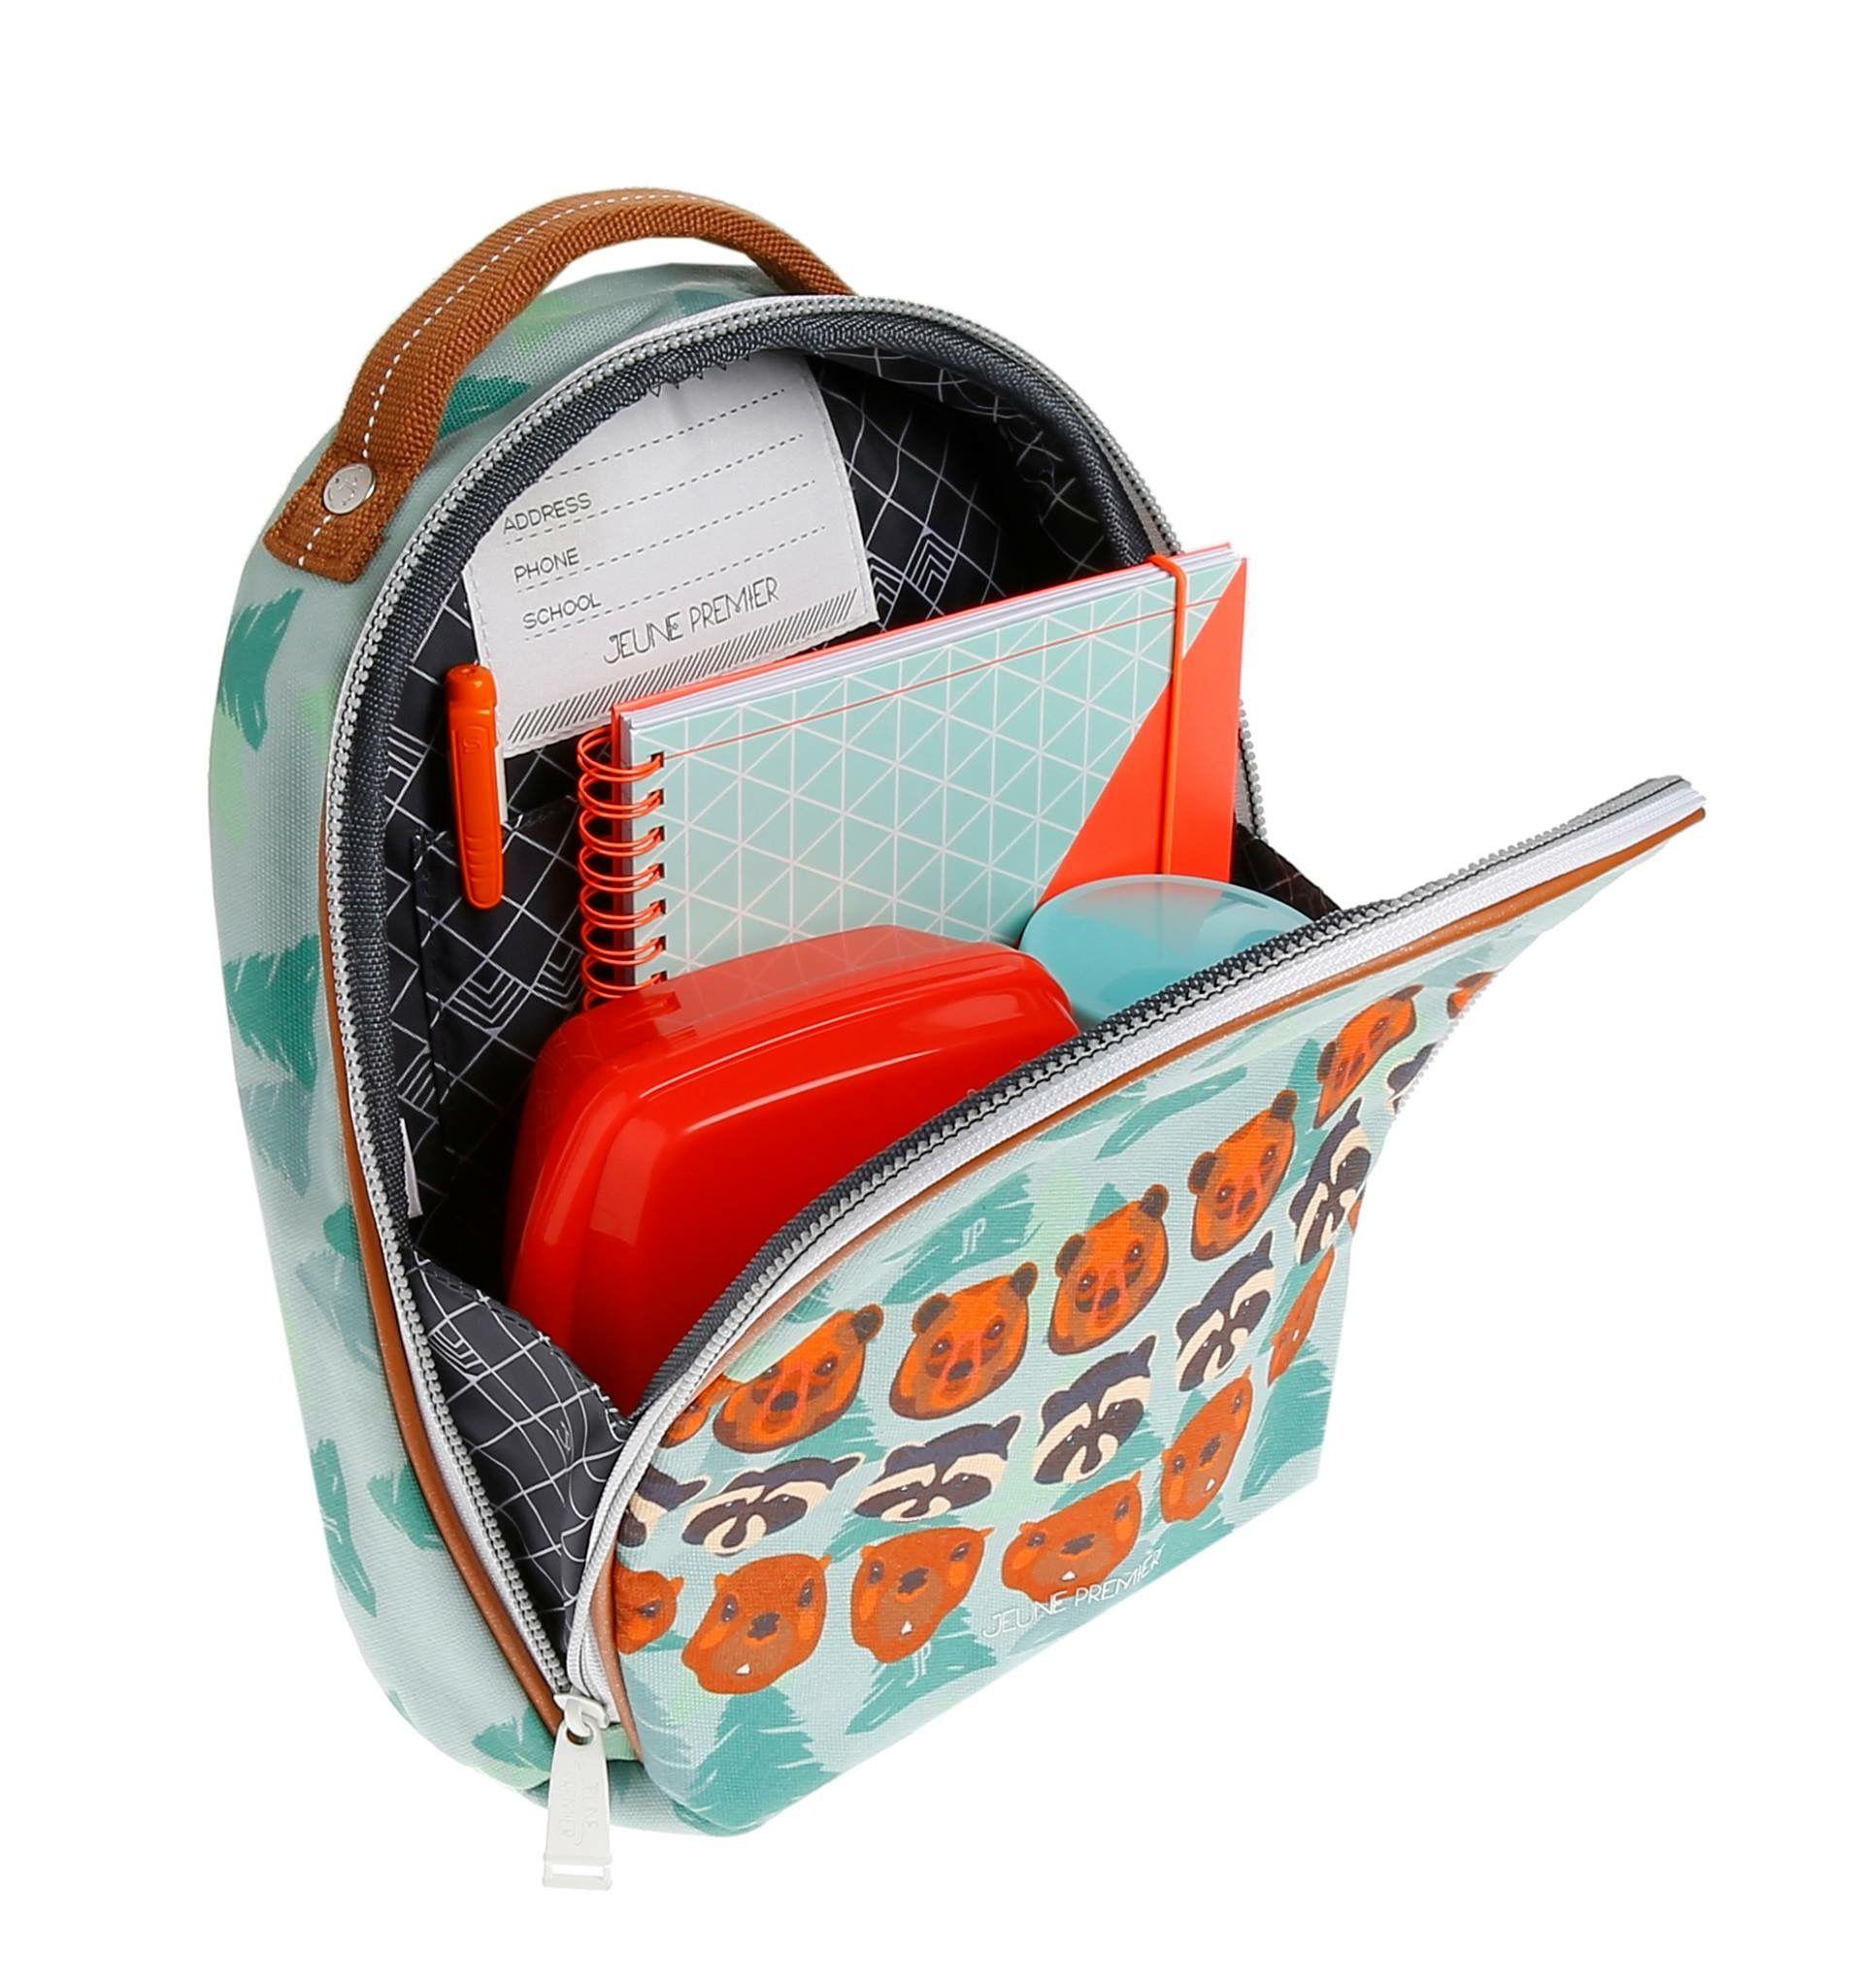 eb85e49a647 Jeune Premier MINI ralphie backpack ❤ #jeunepremier ...